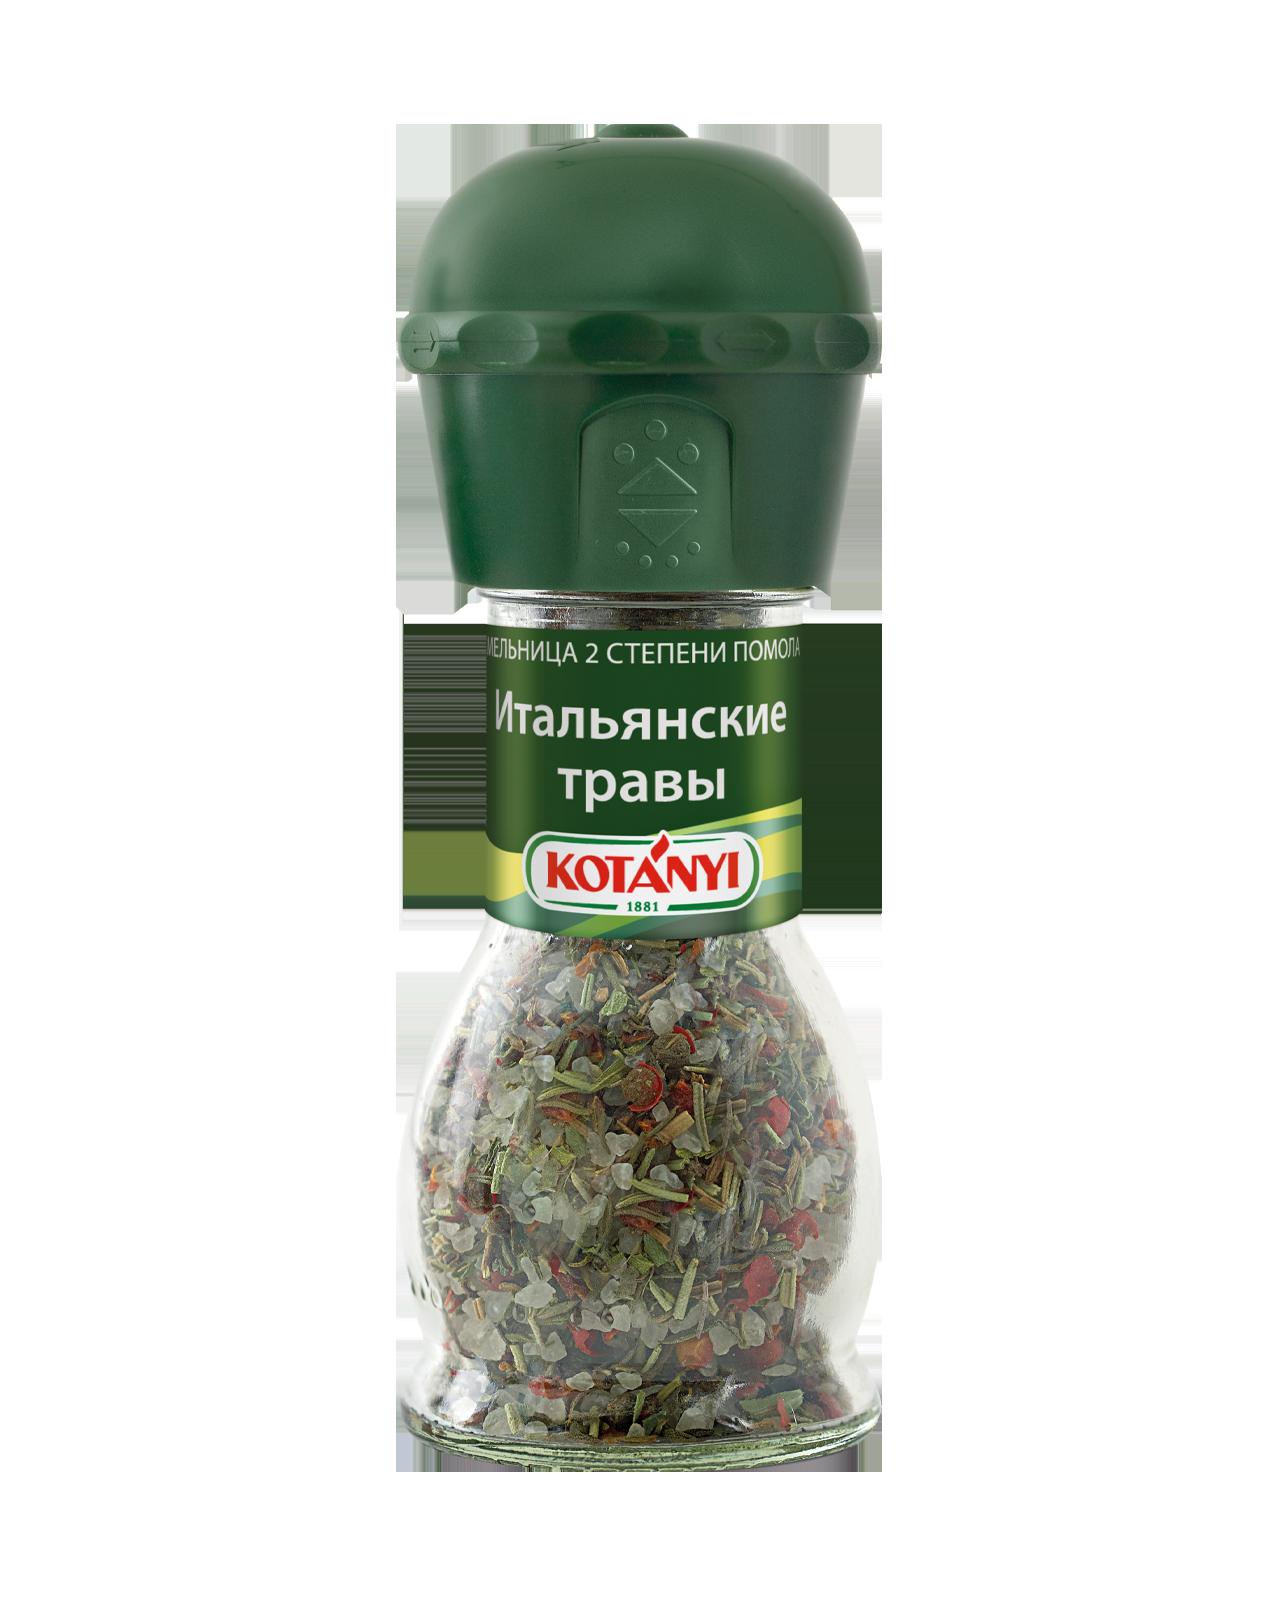 411711 Rustic Herbs Ru Mill